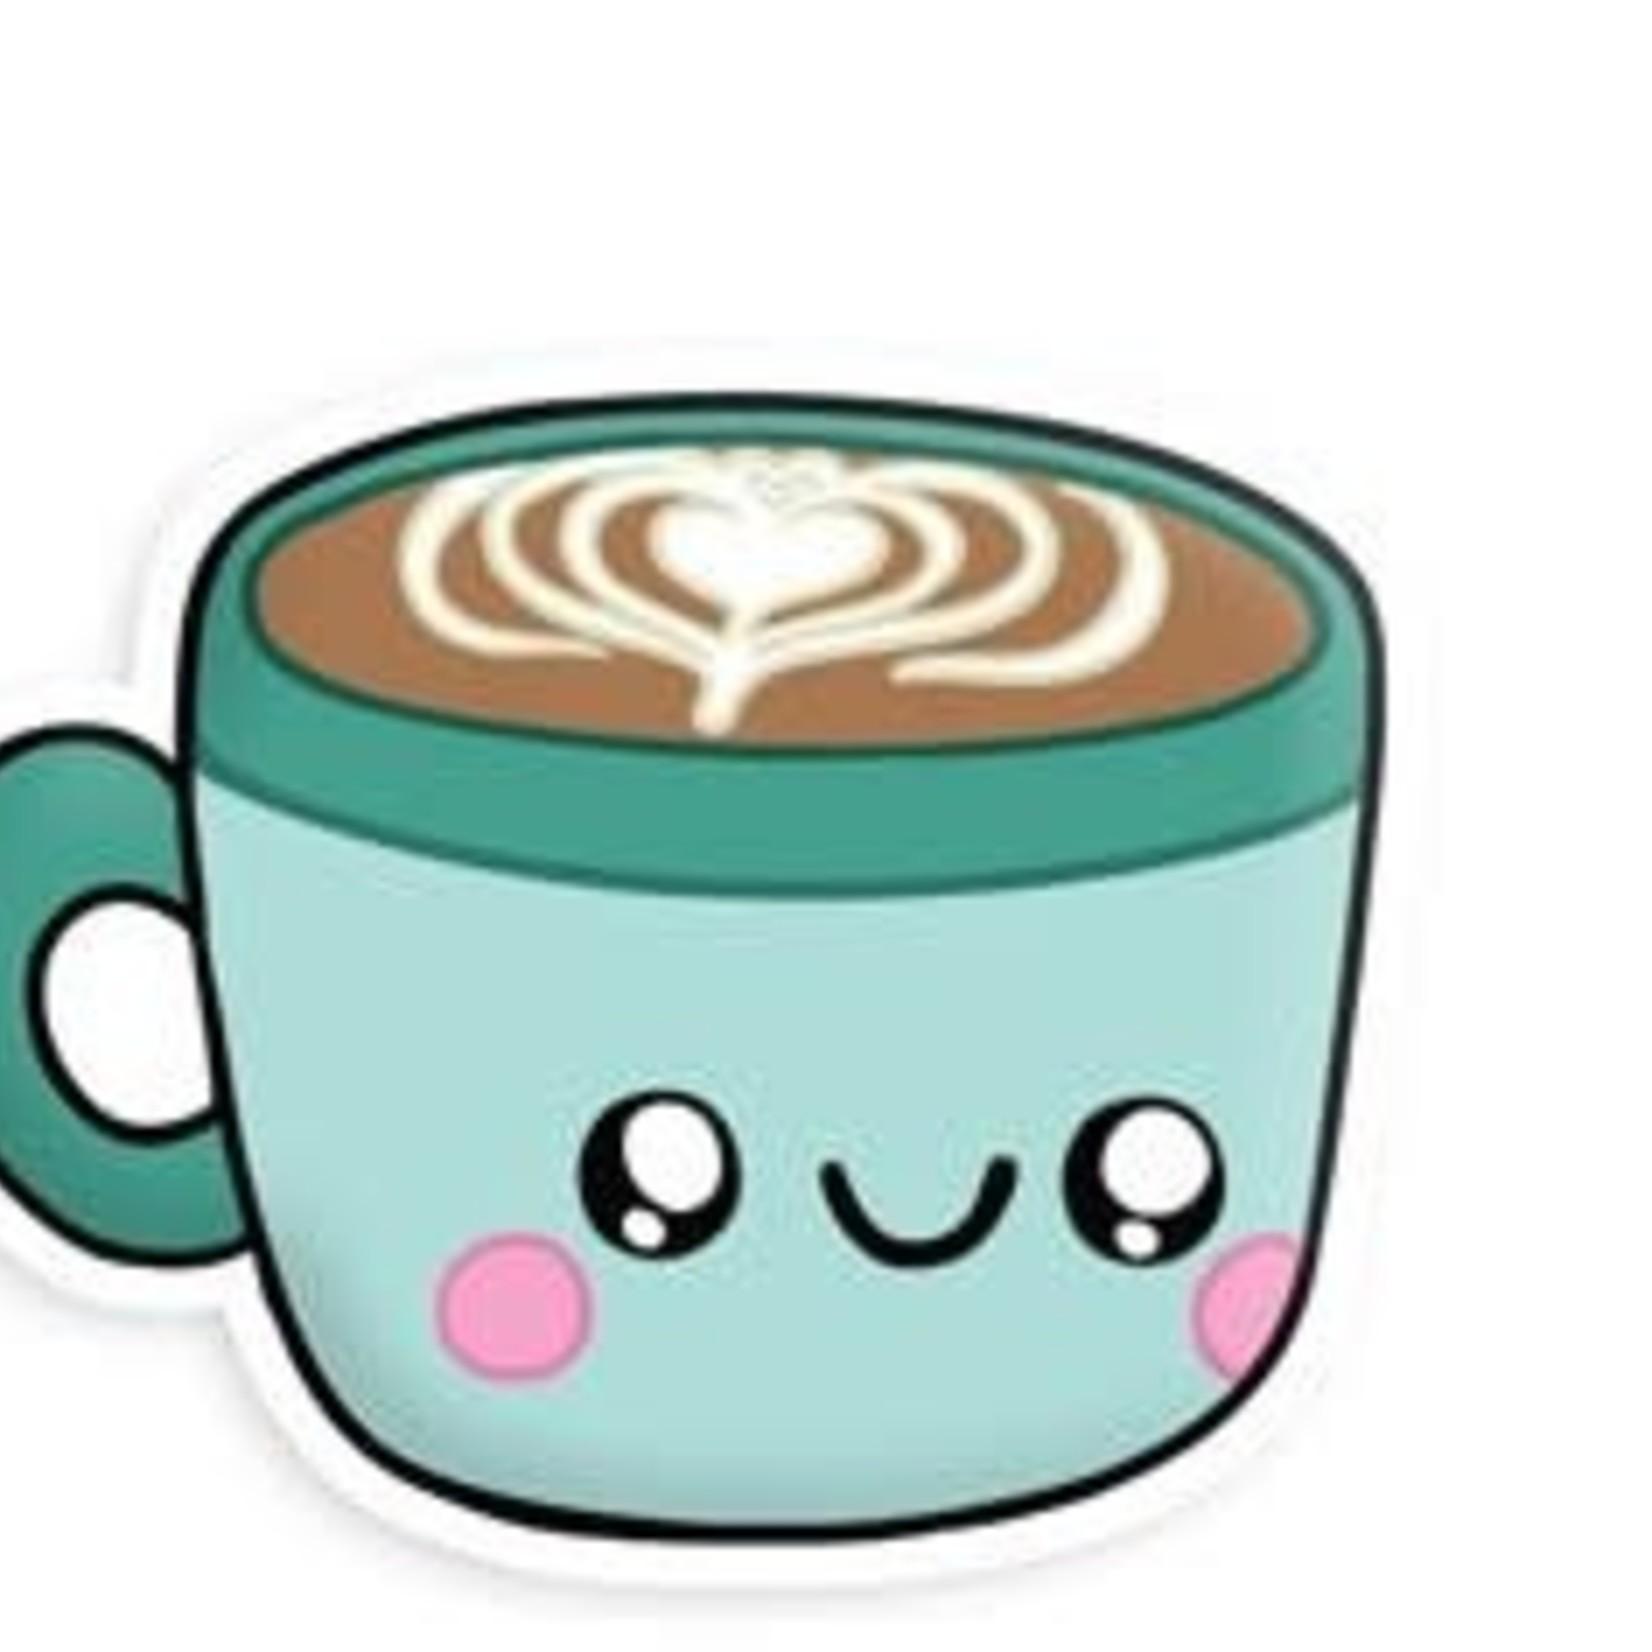 Squishable Latte Sticker